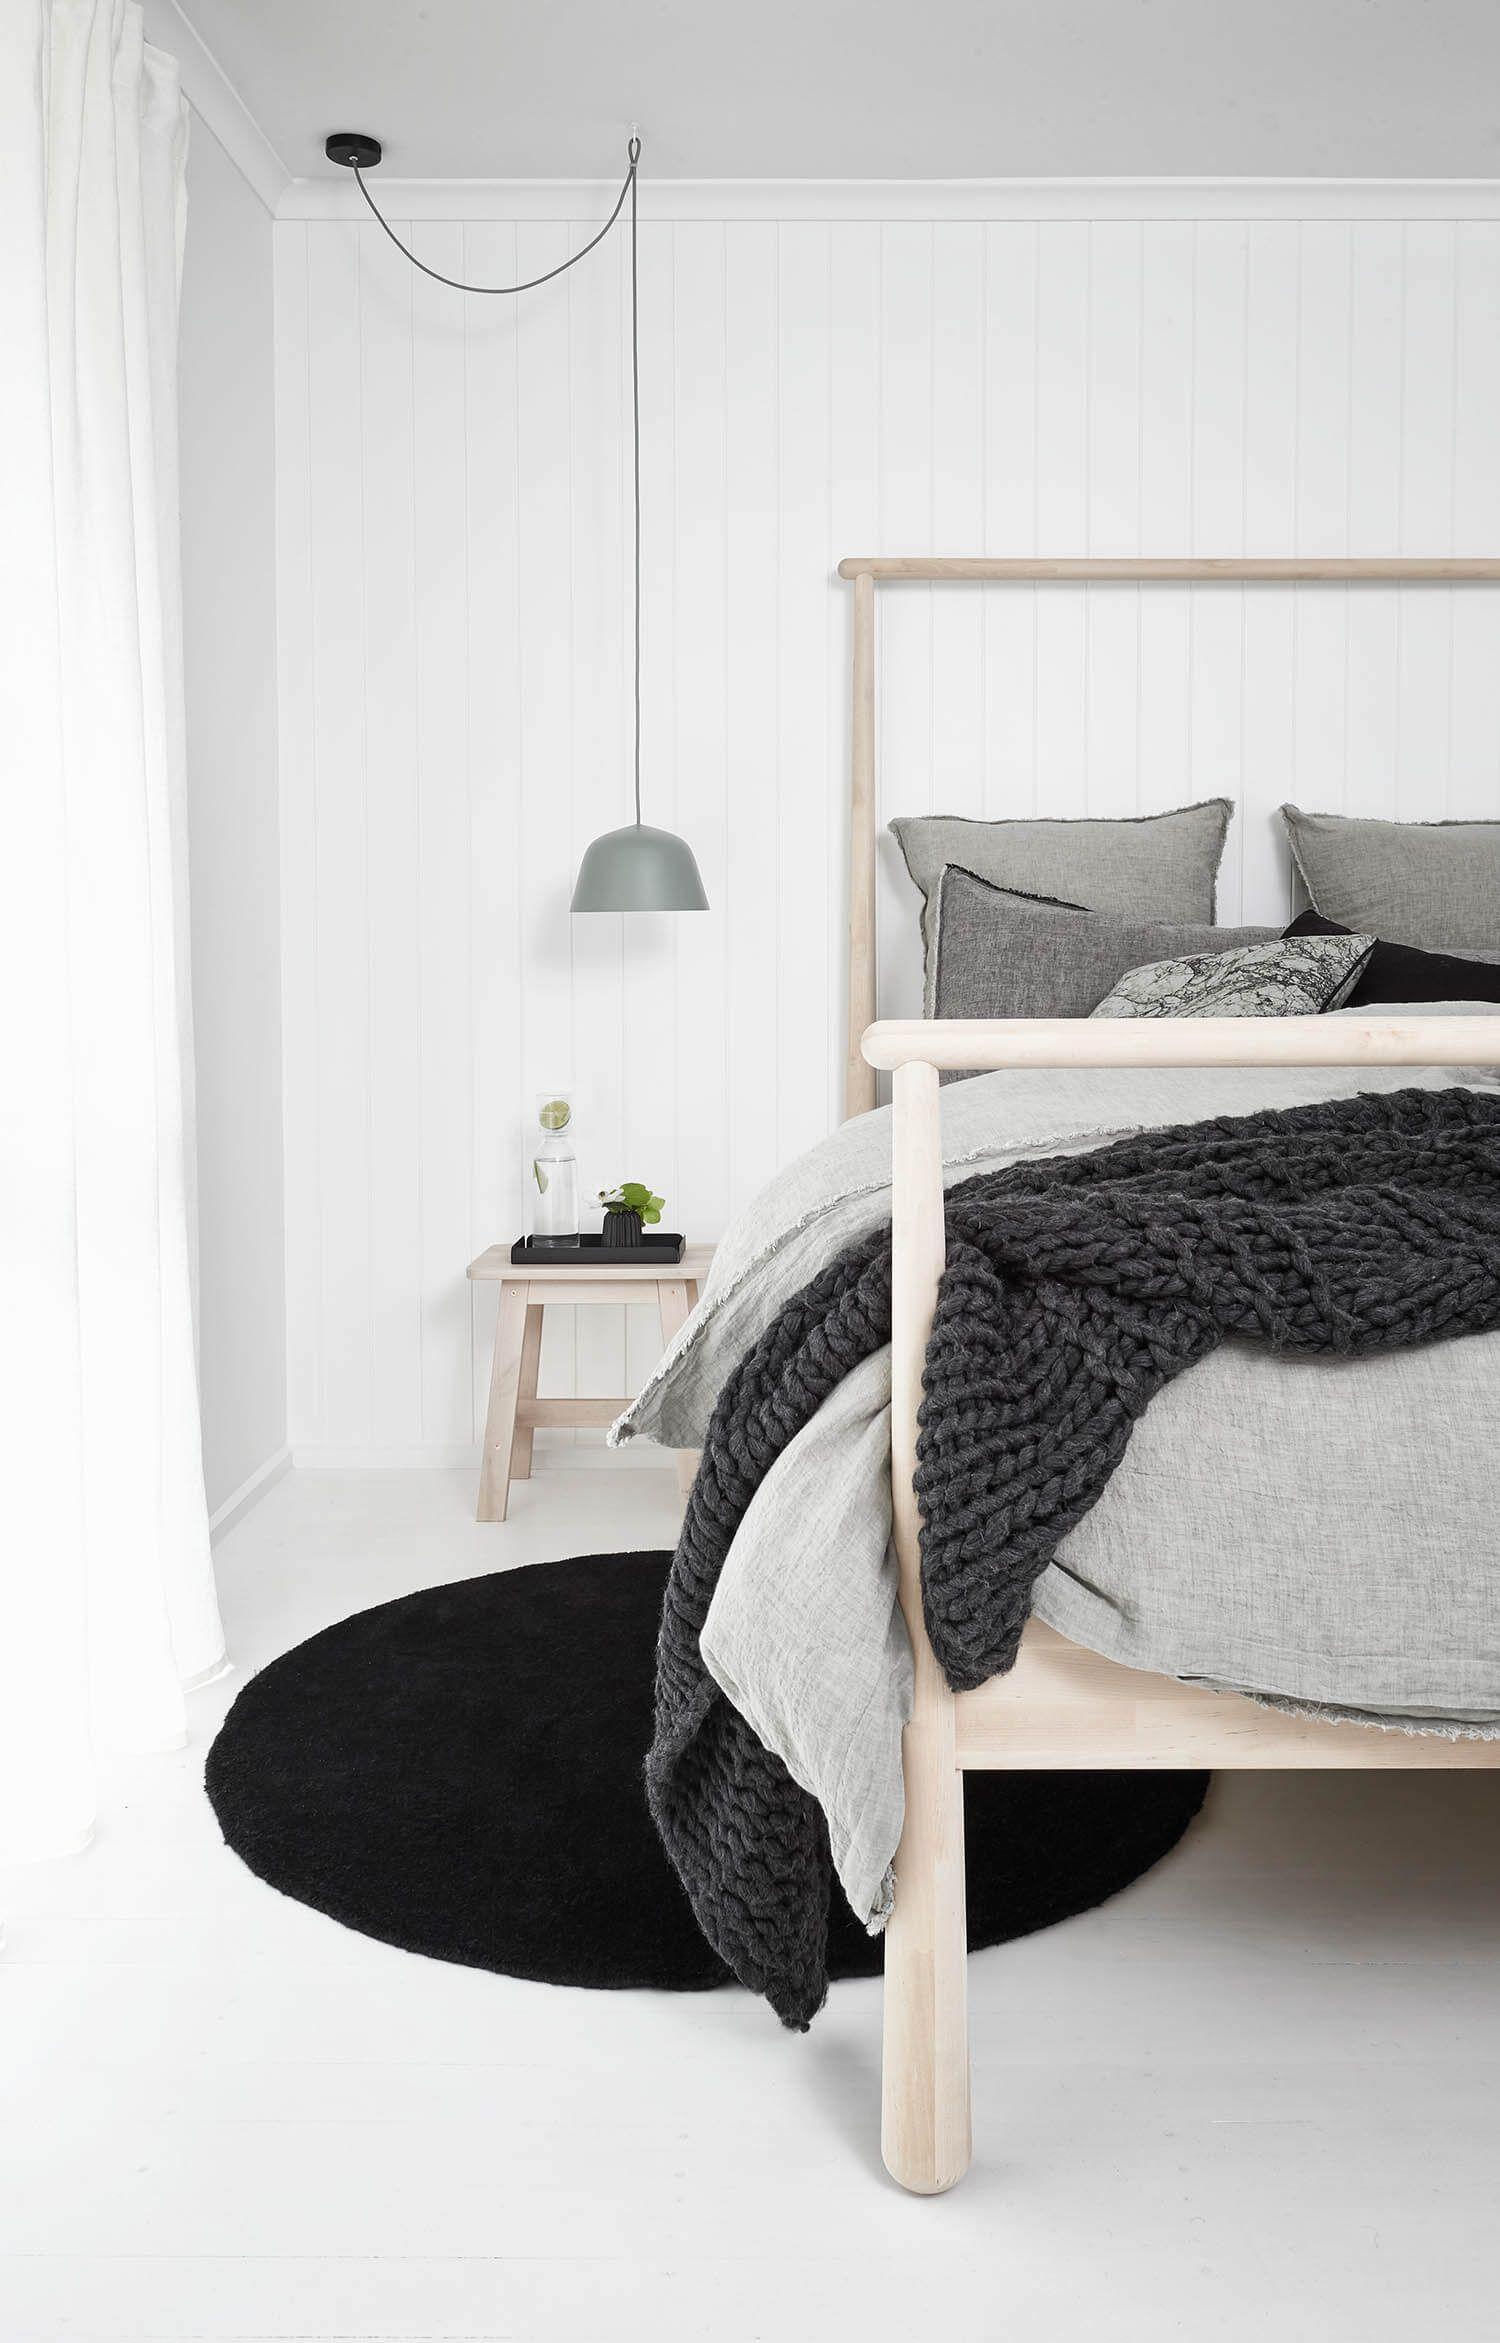 Nord House An Oasis Of Scandinavian Style On The Mornington Peninsula Bedroom Interior Bedroom Design Minimalism Interior